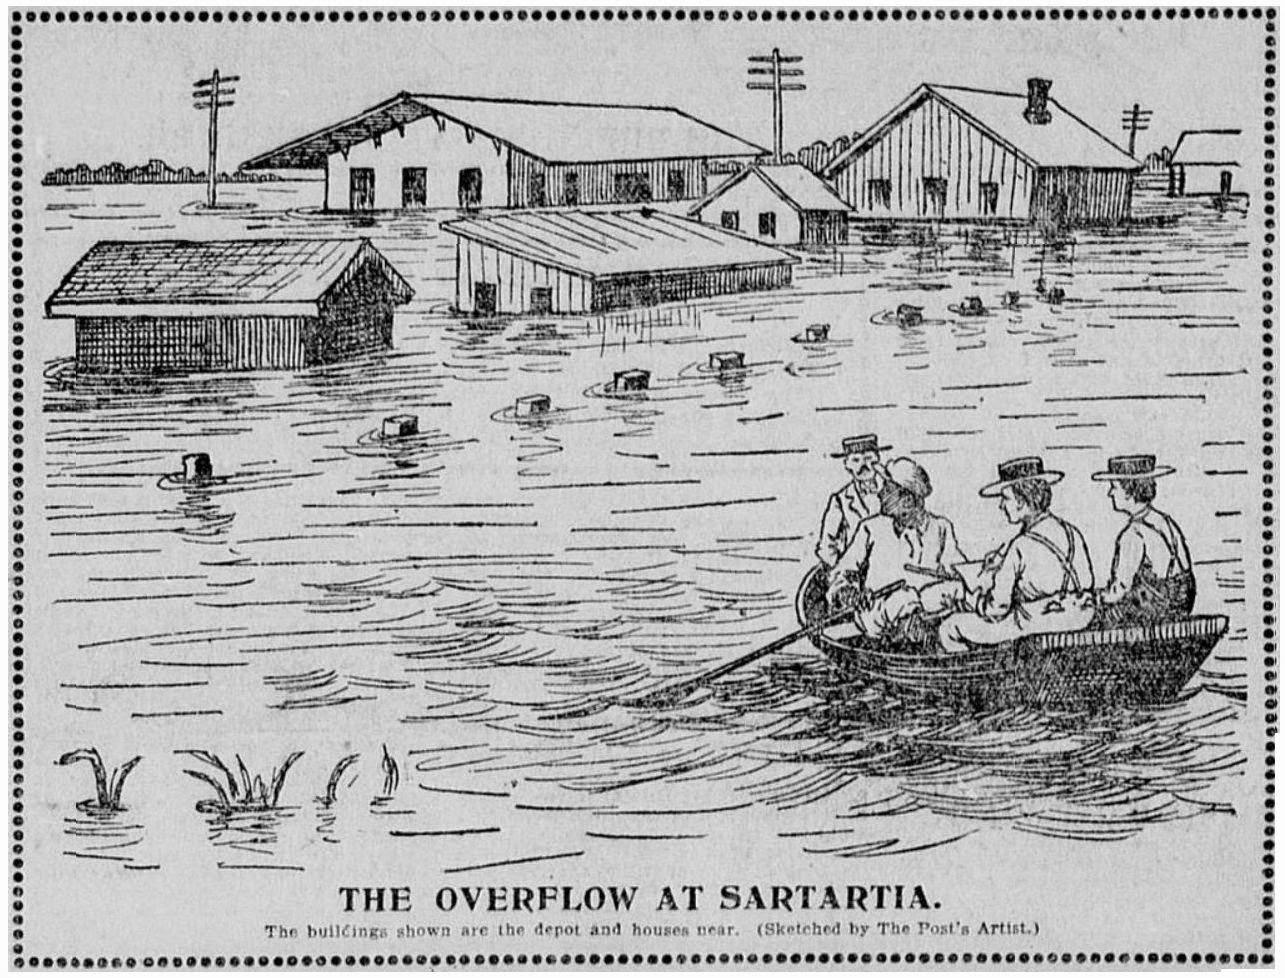 The Old Sugar Land Club House: 1899 Flood